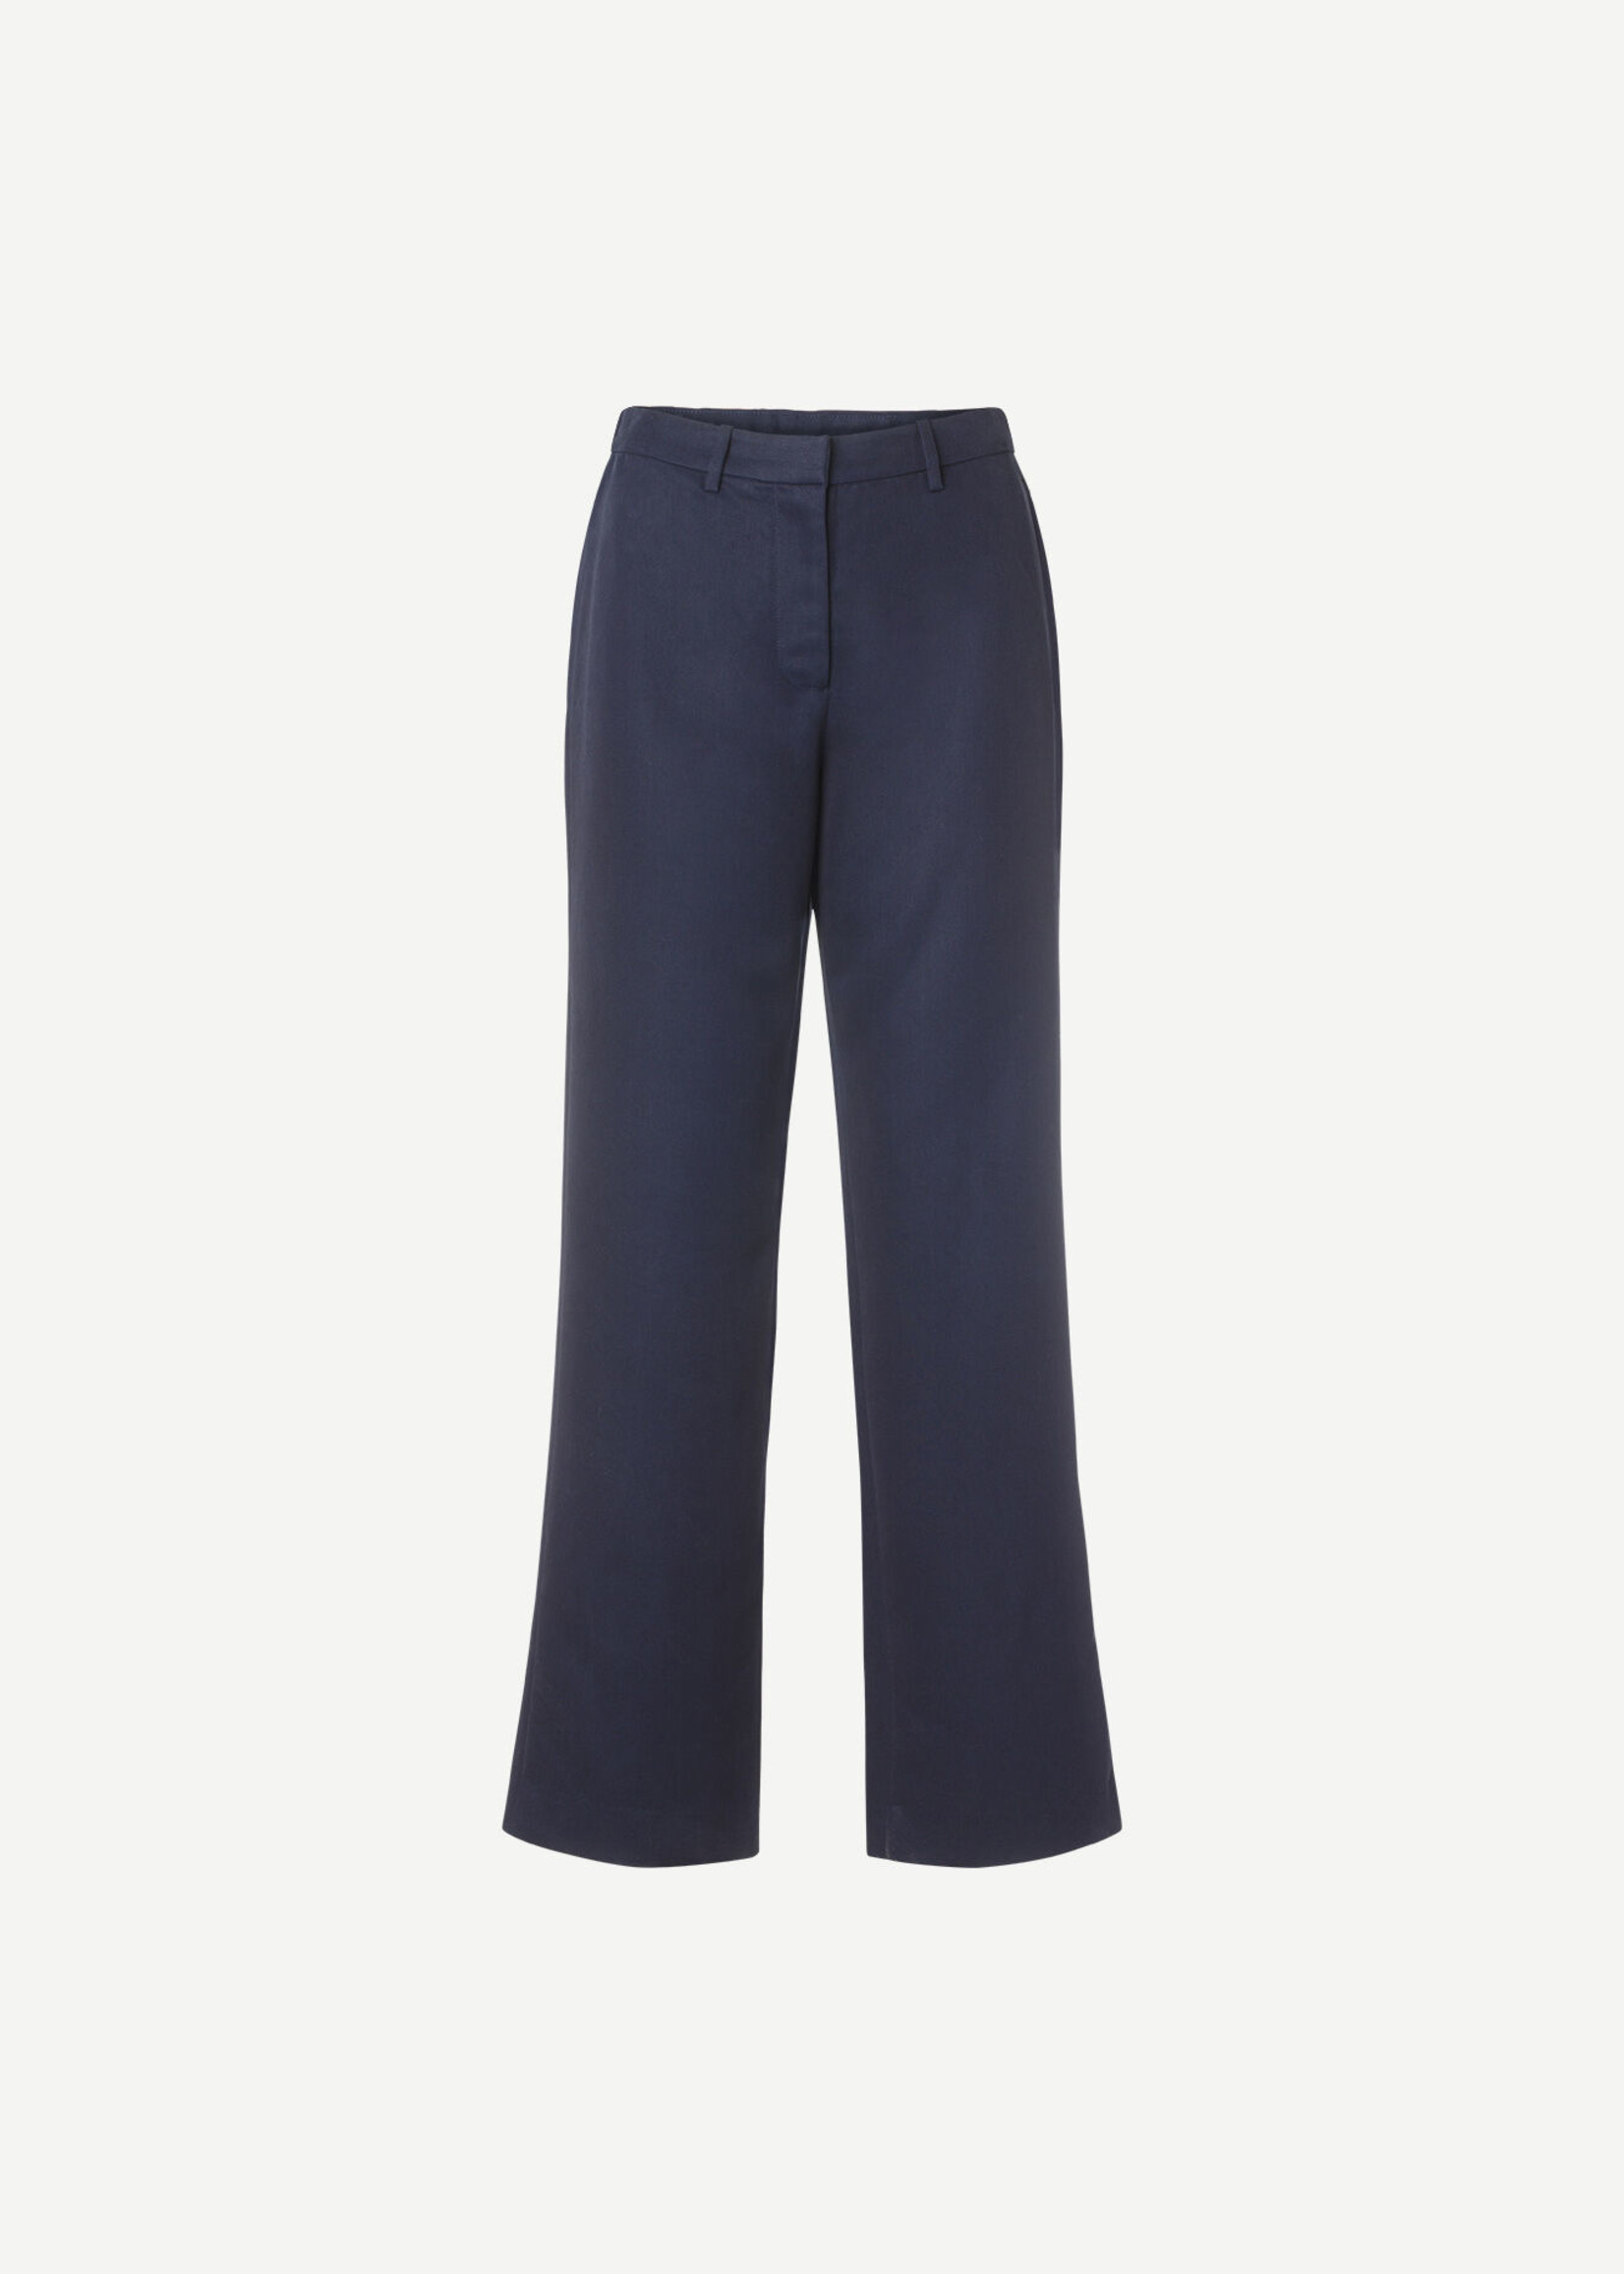 Samsoe & Samsoe Hoys F Trousers 13005